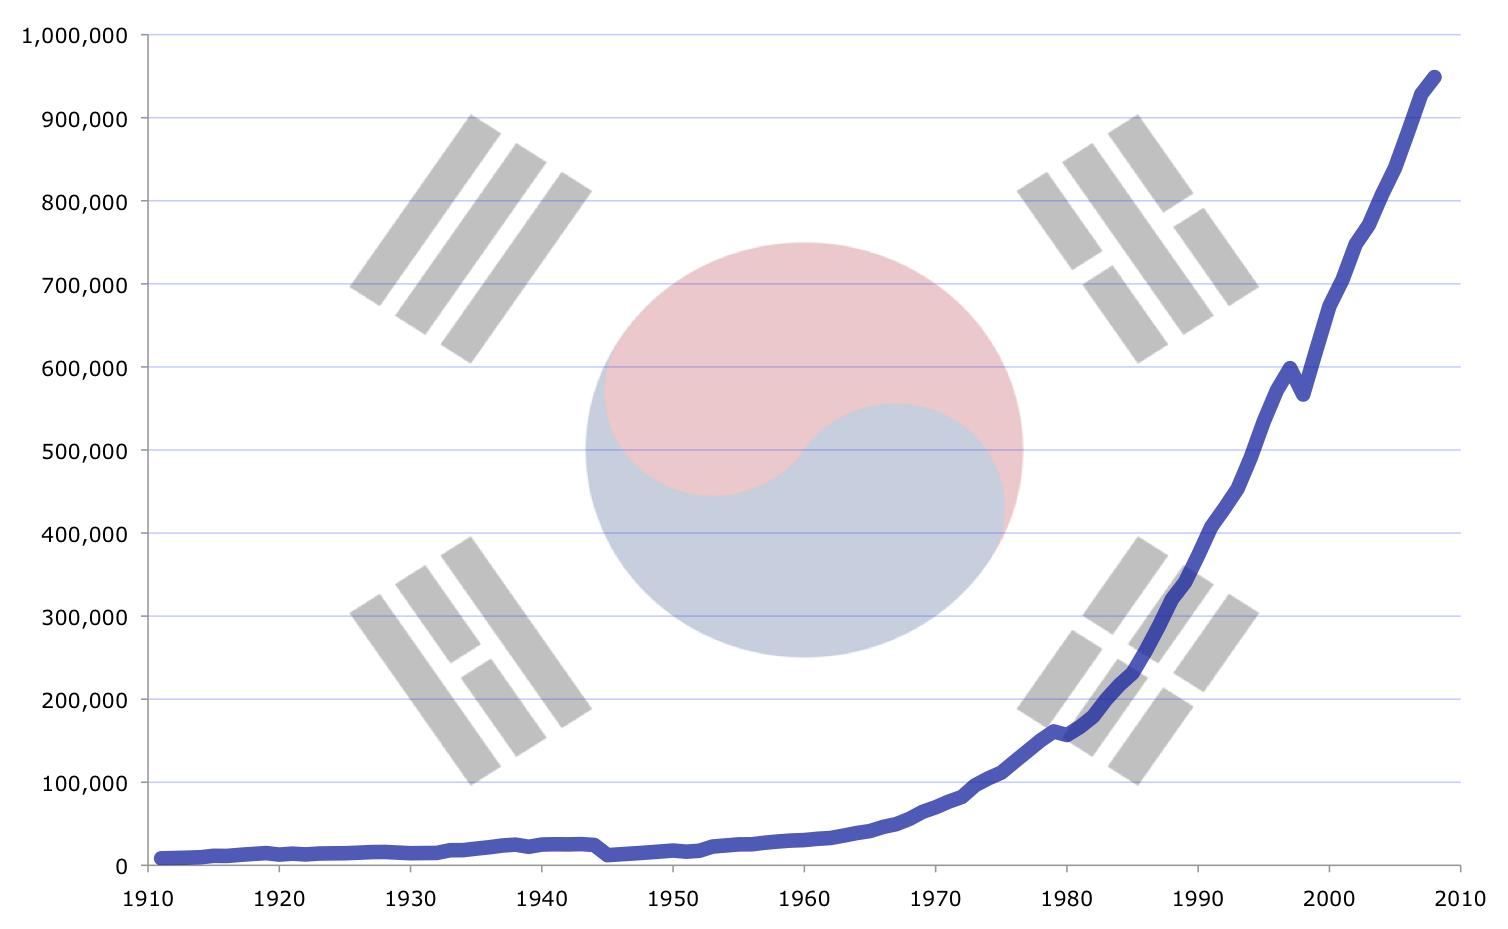 gdp和产值_一季度我国批发和零售产值占GDP当季比重10.28(3)